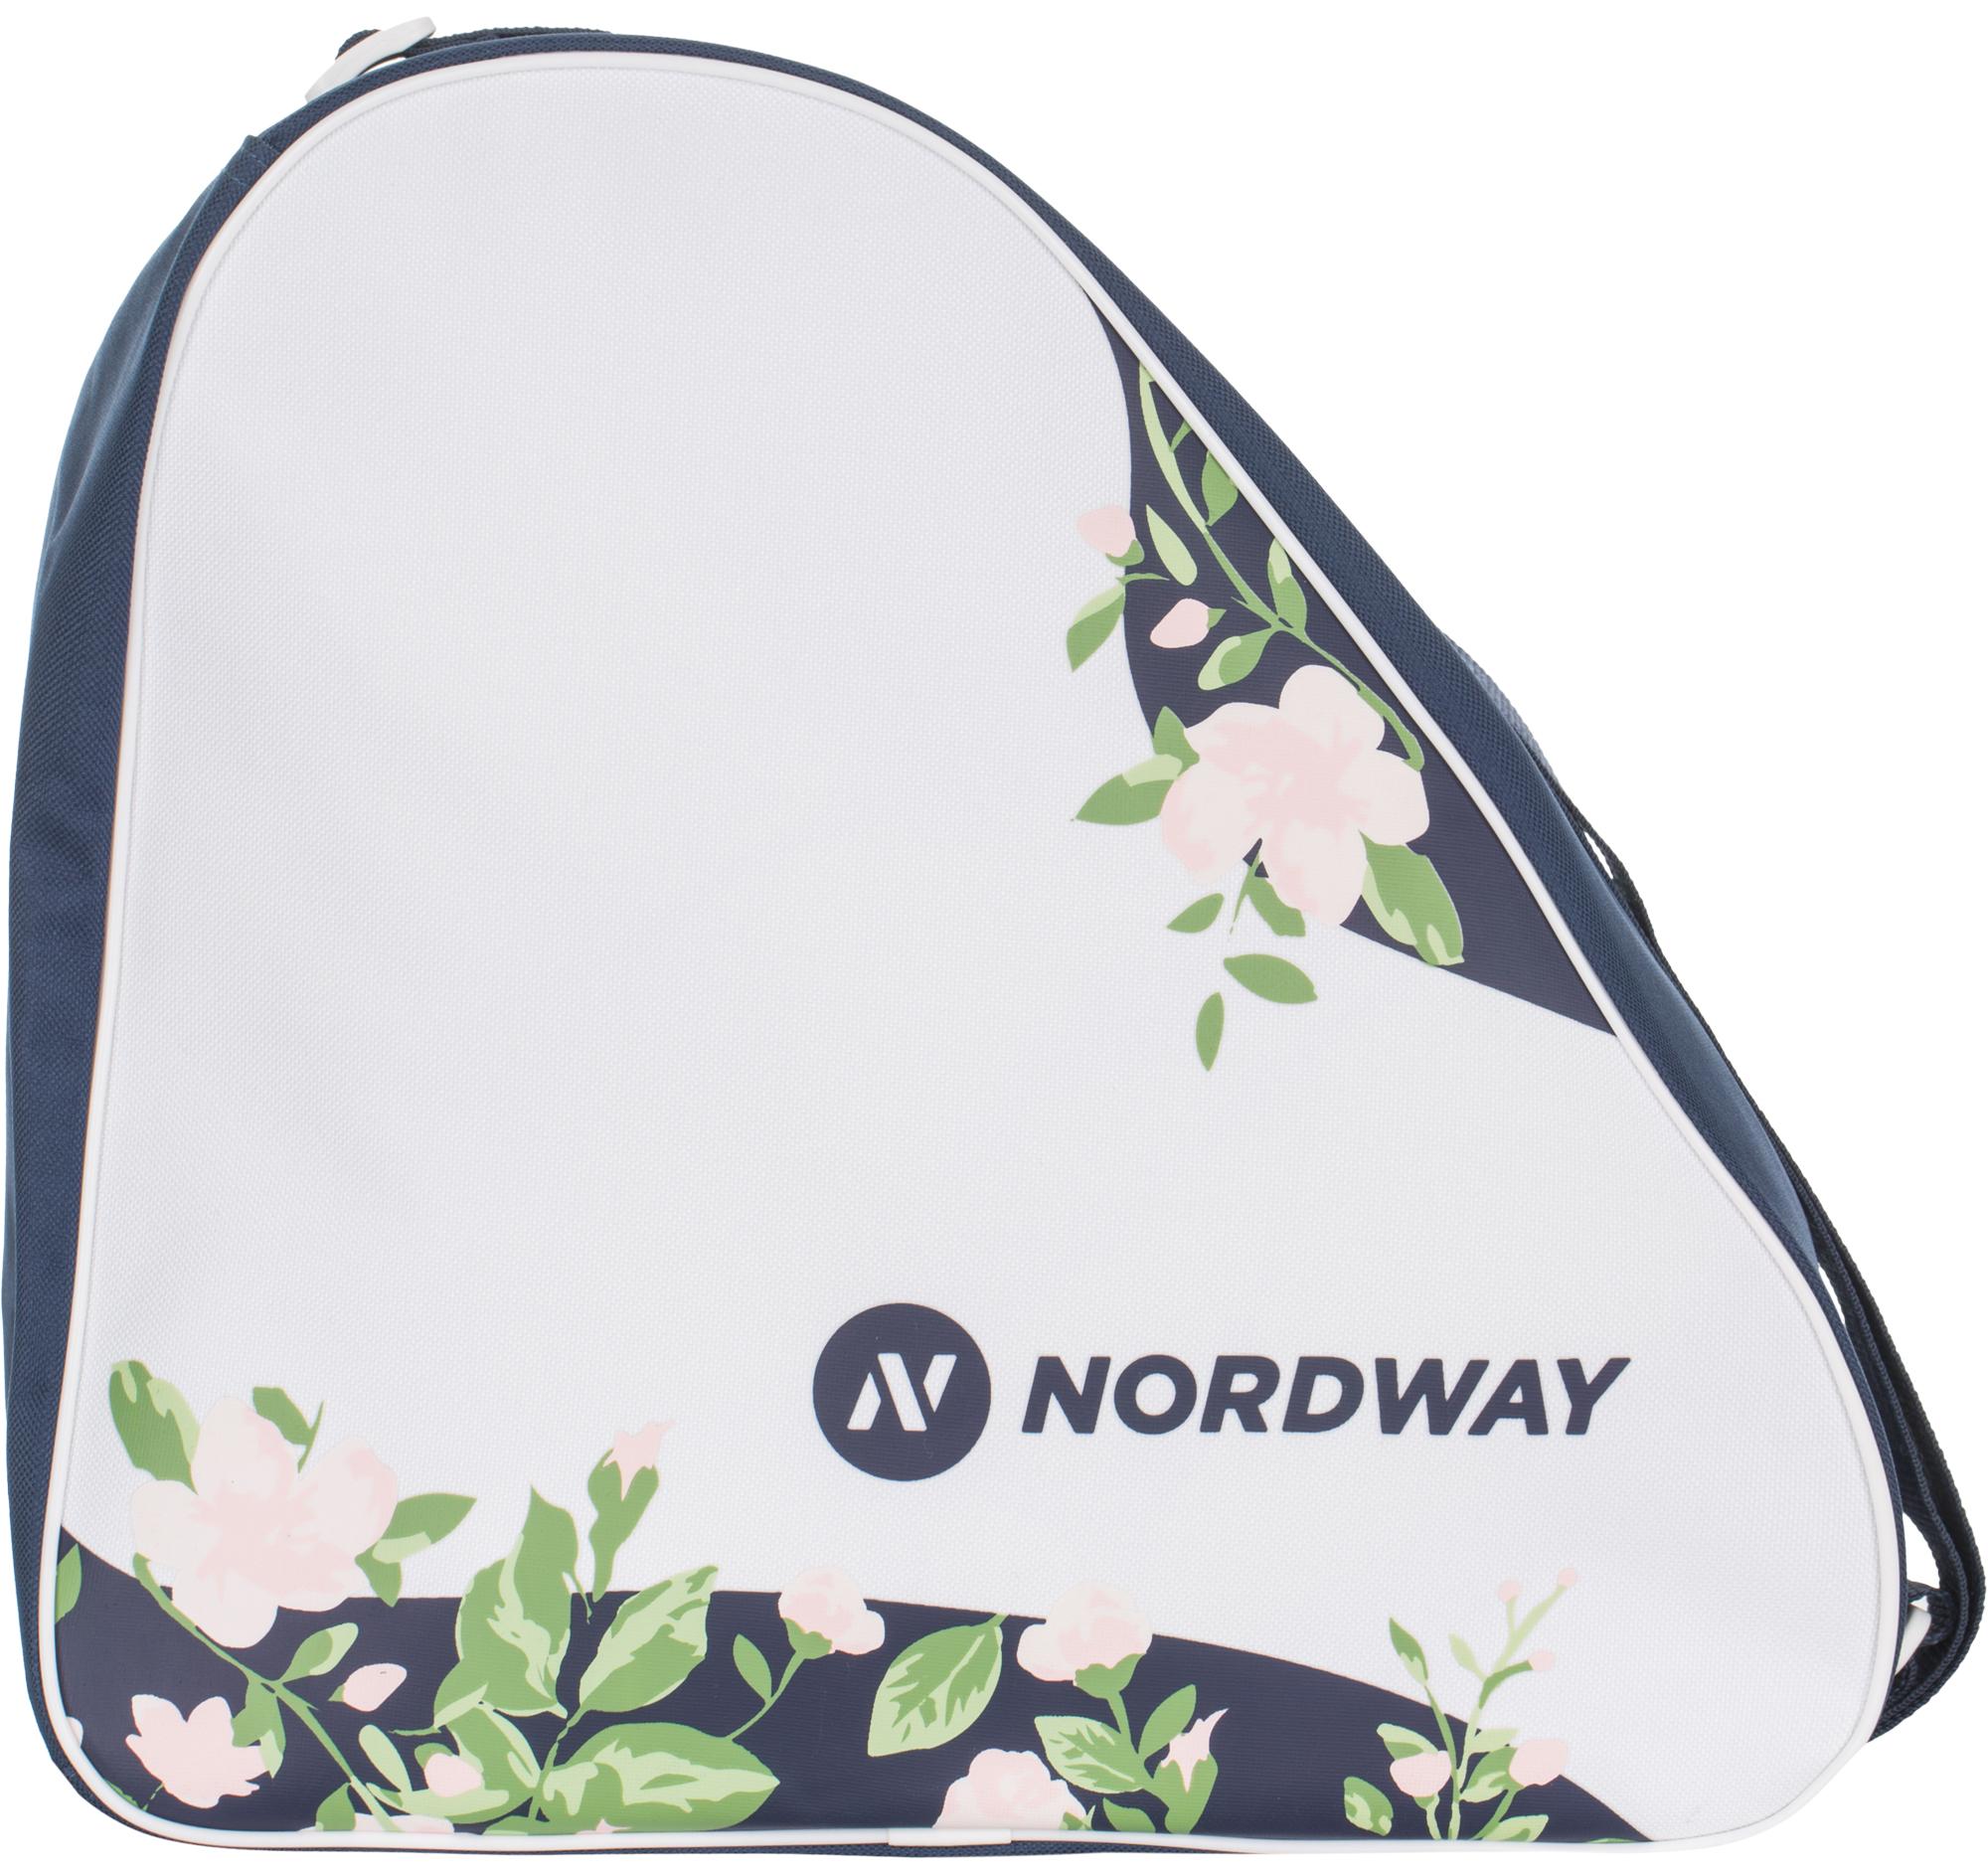 Nordway Сумка для переноски ледовых коньков Nordway, размер Без размера цены онлайн